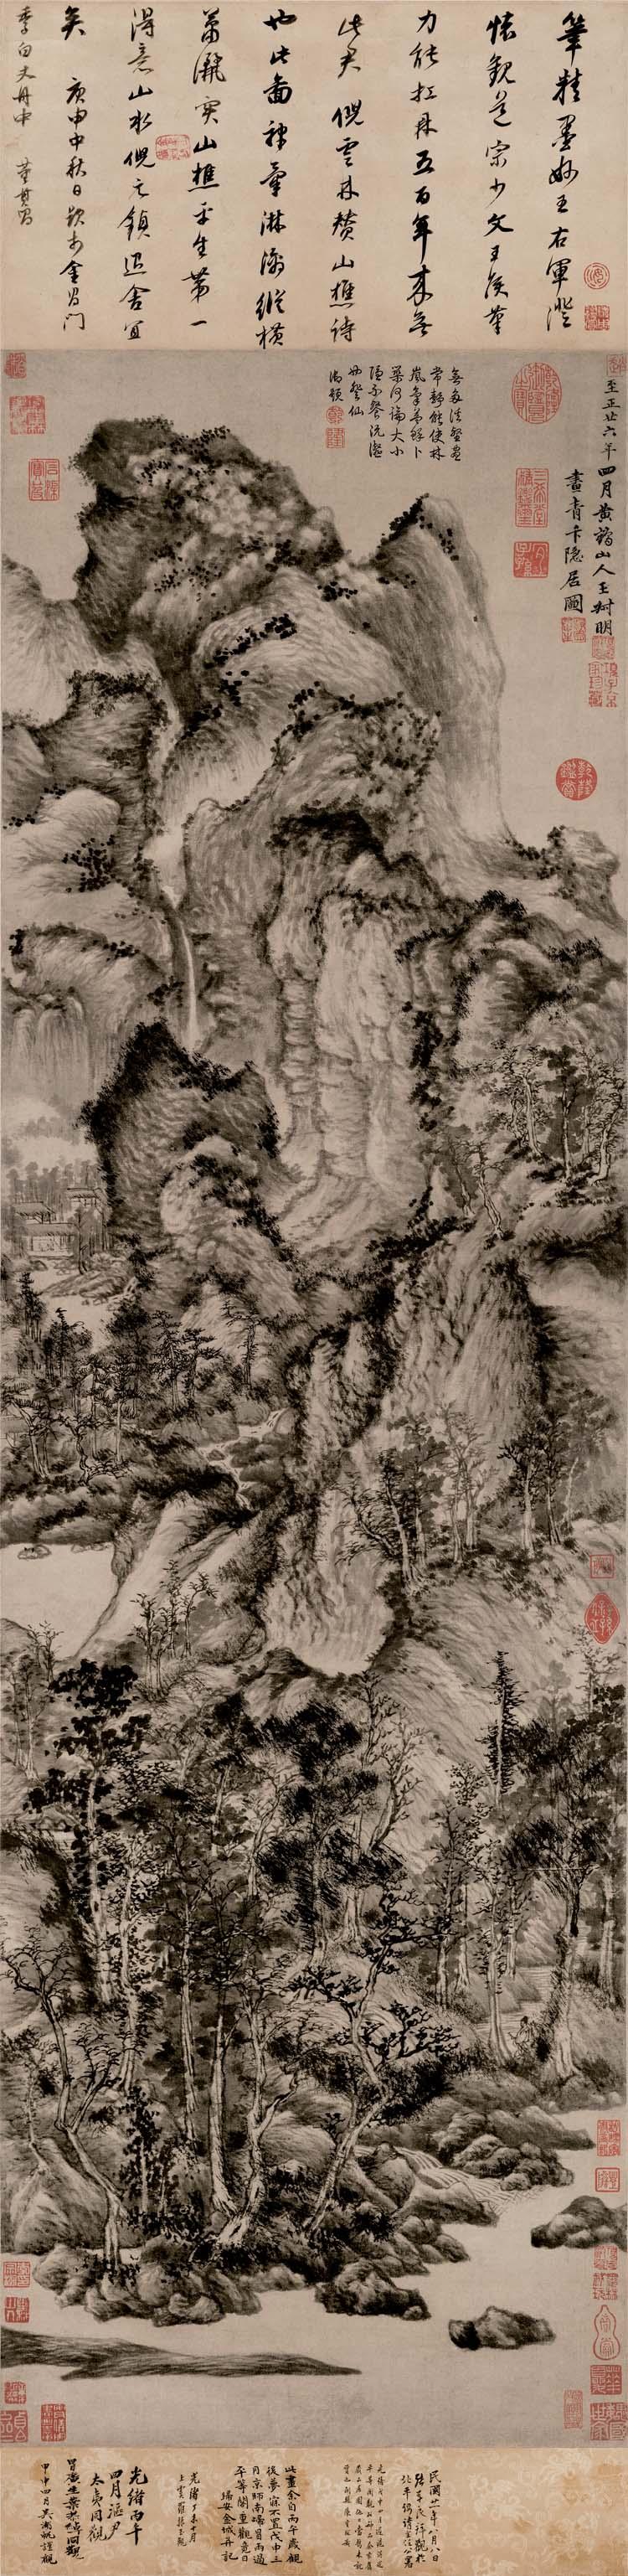 Dwelling in Reclusion in the Bian Mountain